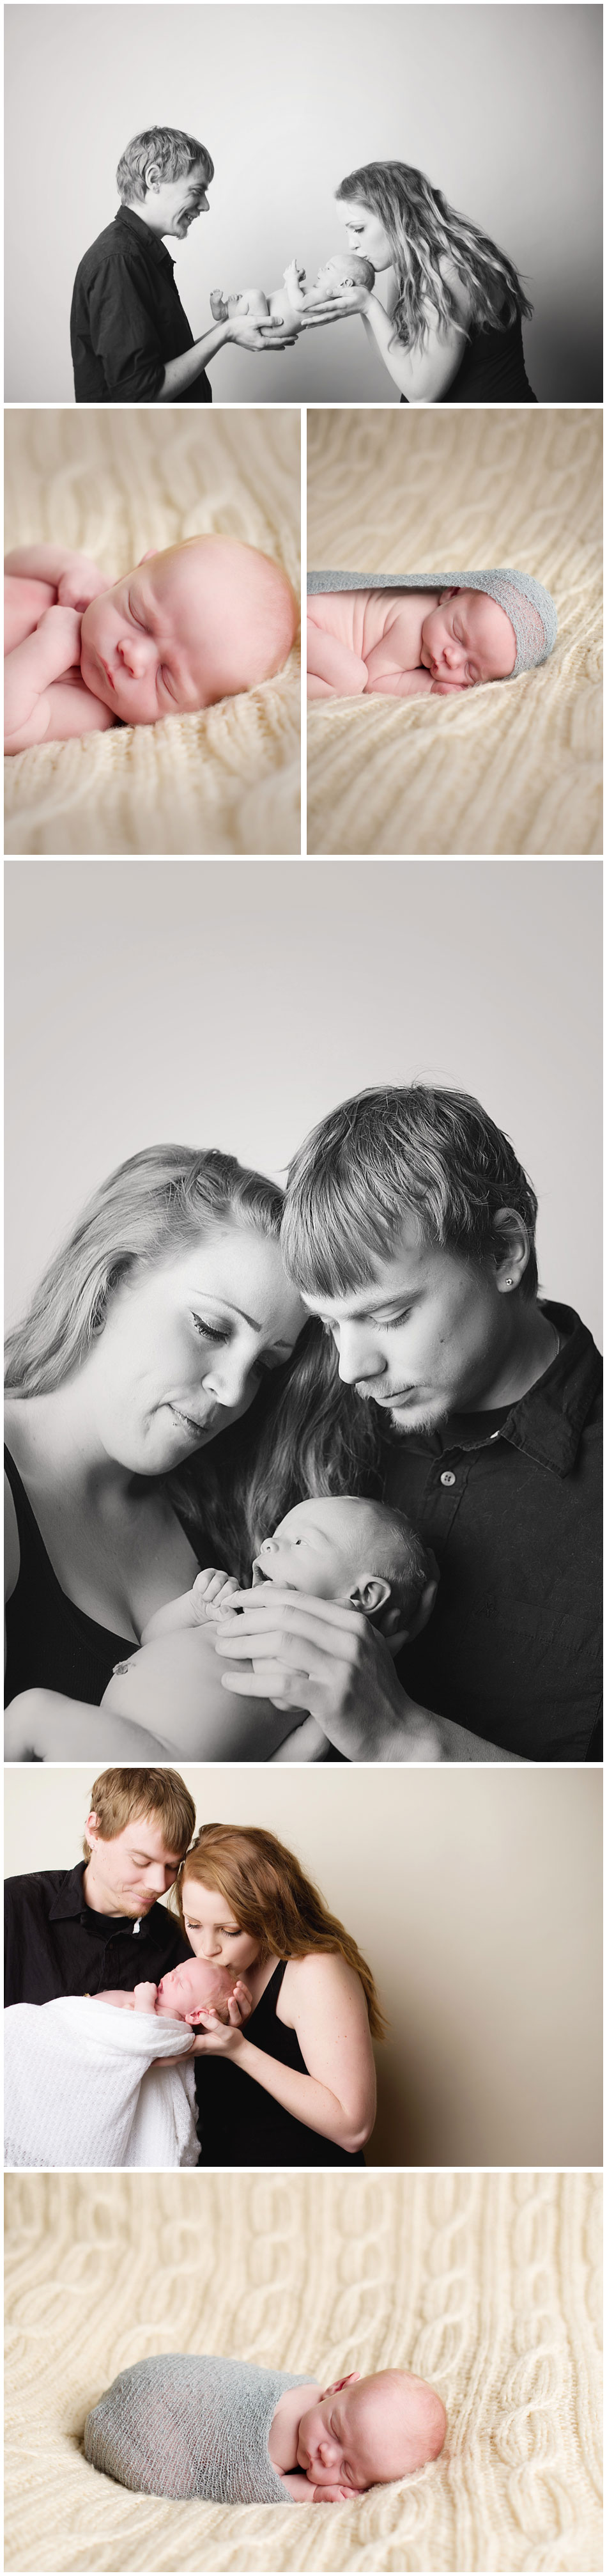 baby-and-family-photographer-billings-montana-tina-stinson-itty-bitty-portraits.jpg